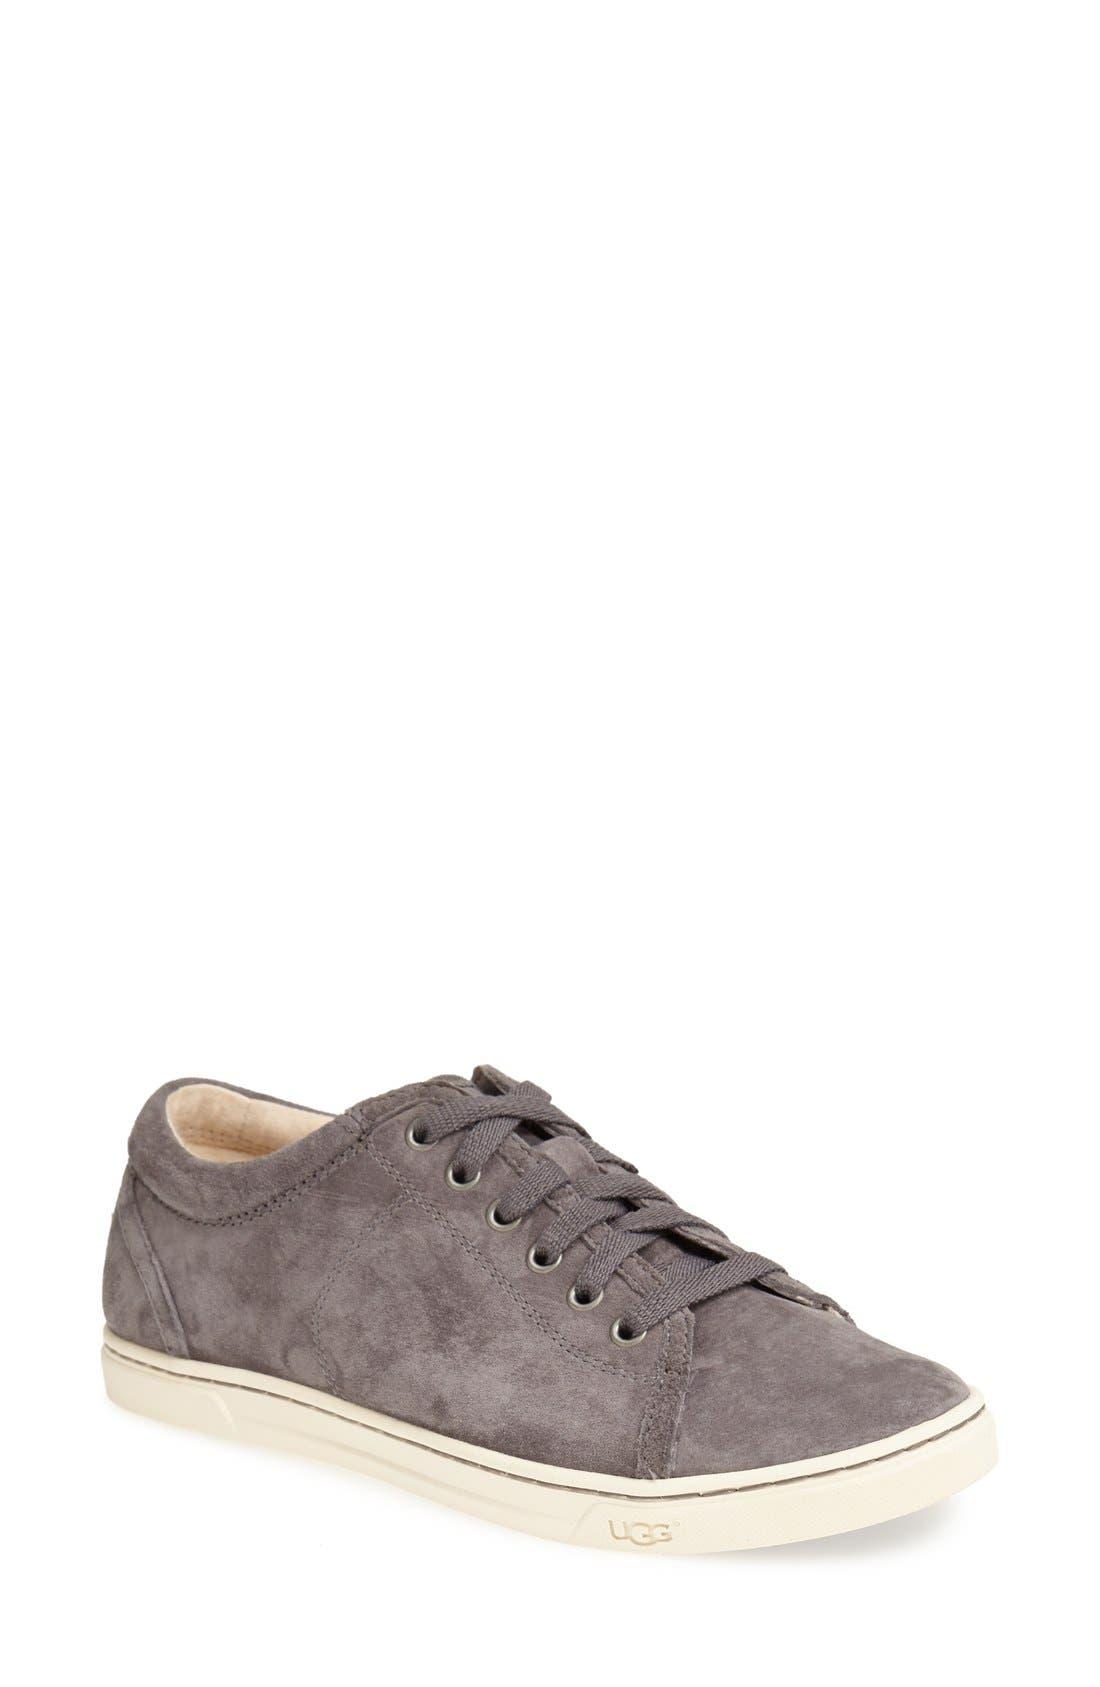 Main Image - UGG® 'Tomi' Water Resistant Suede Sneaker (Women)